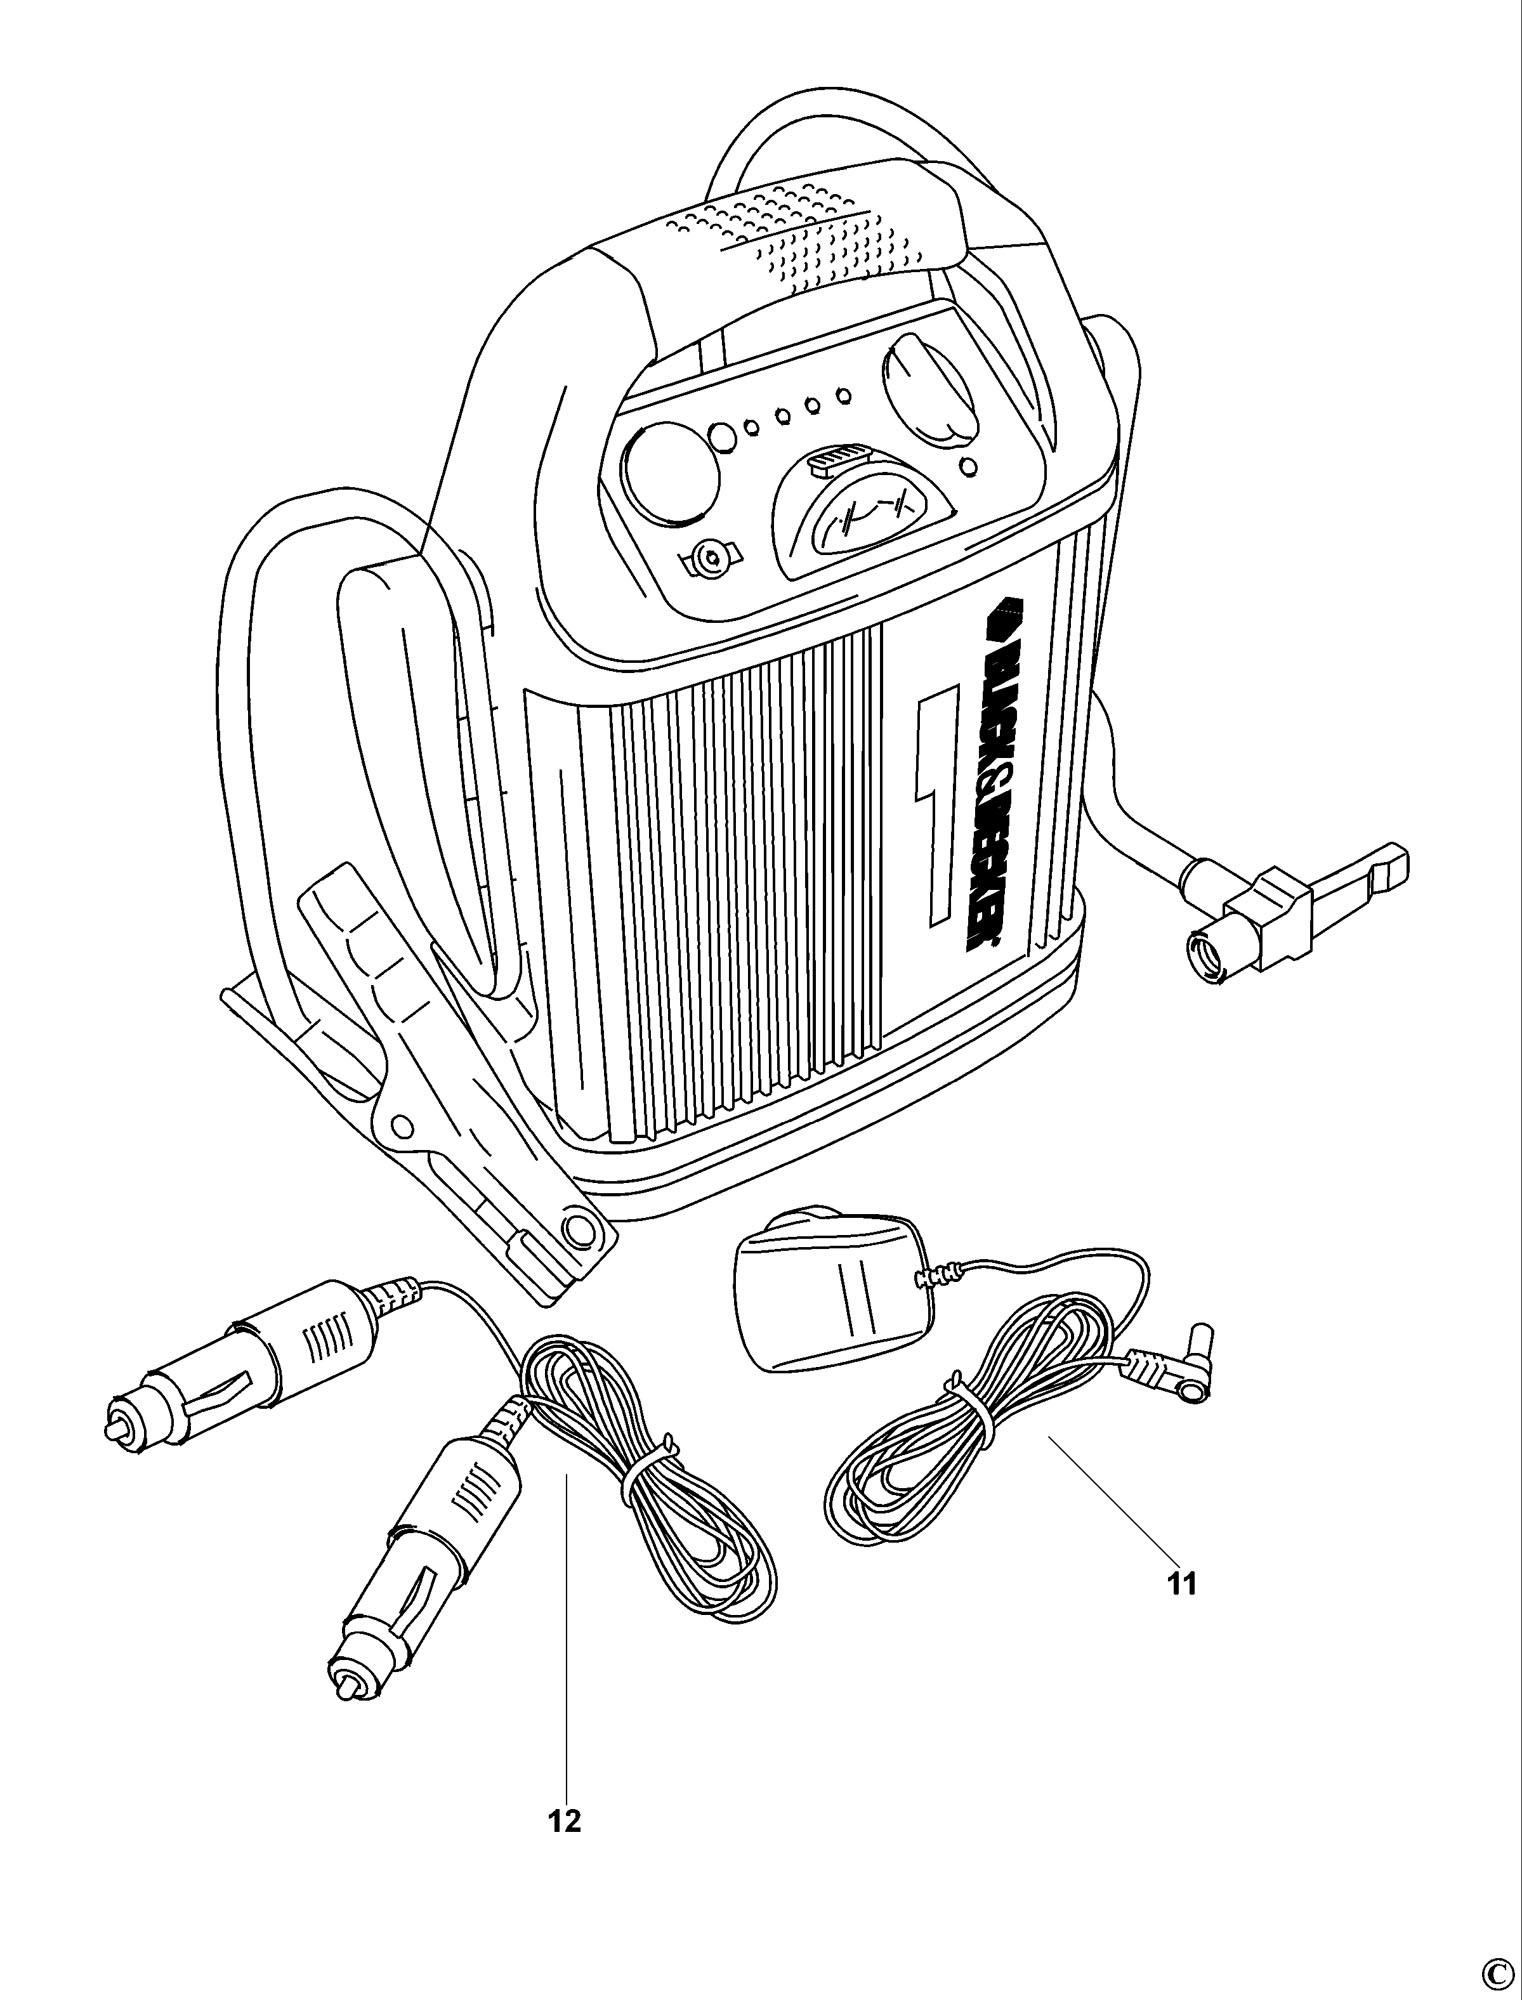 Spares for Black & Decker Bdv012i Jump Starter (type 1